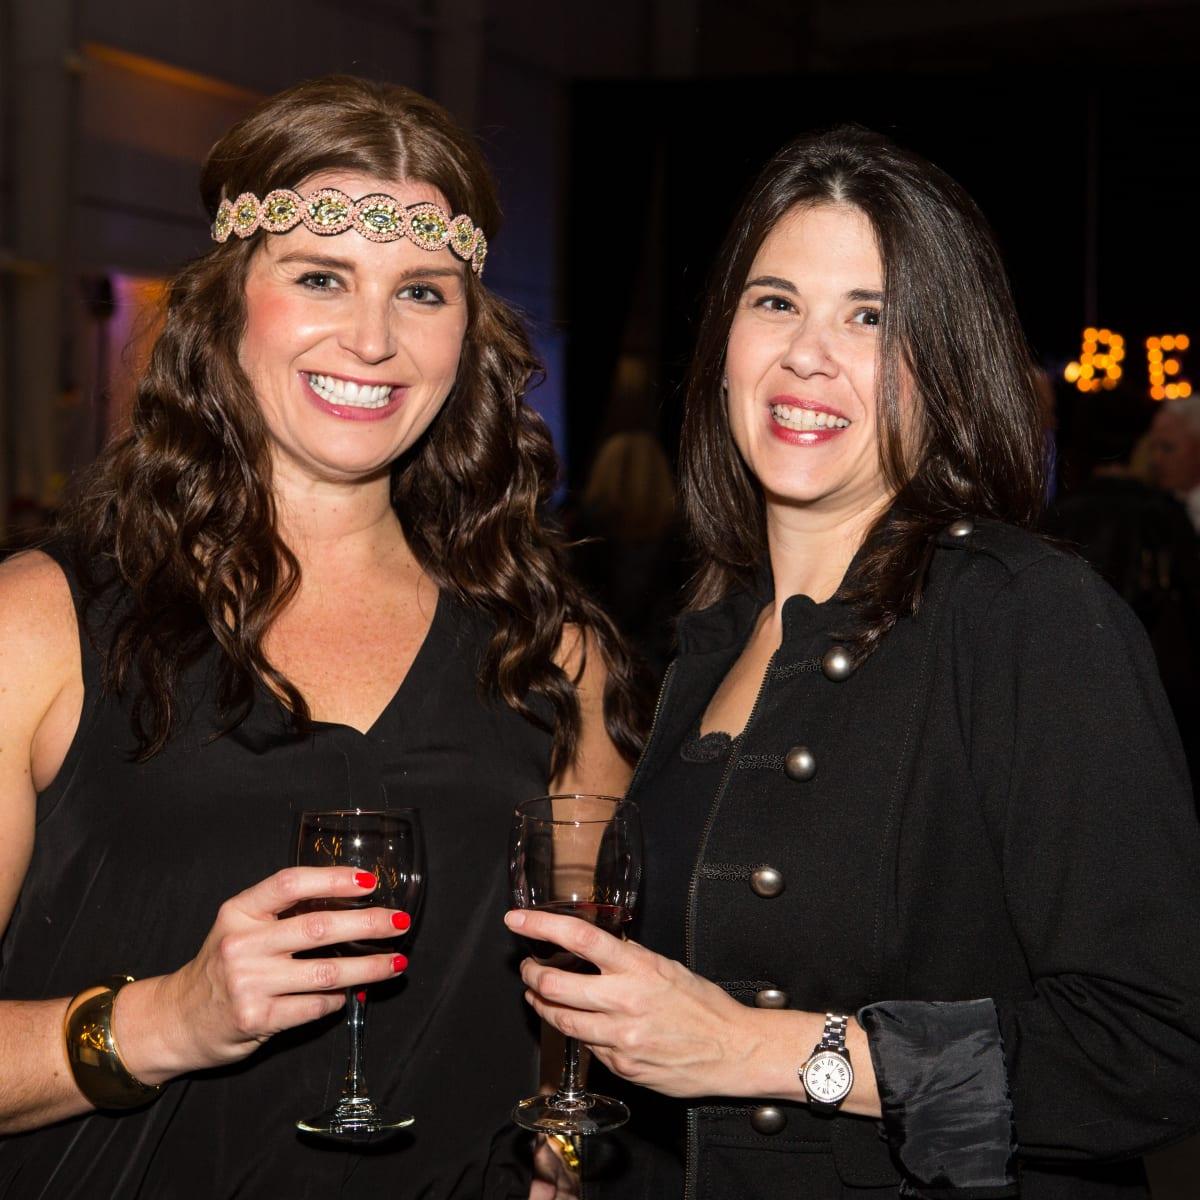 News, Beaujolais Nouveau Festival, Nov. 2015, Angelica Toupard and Kate Wassenberg